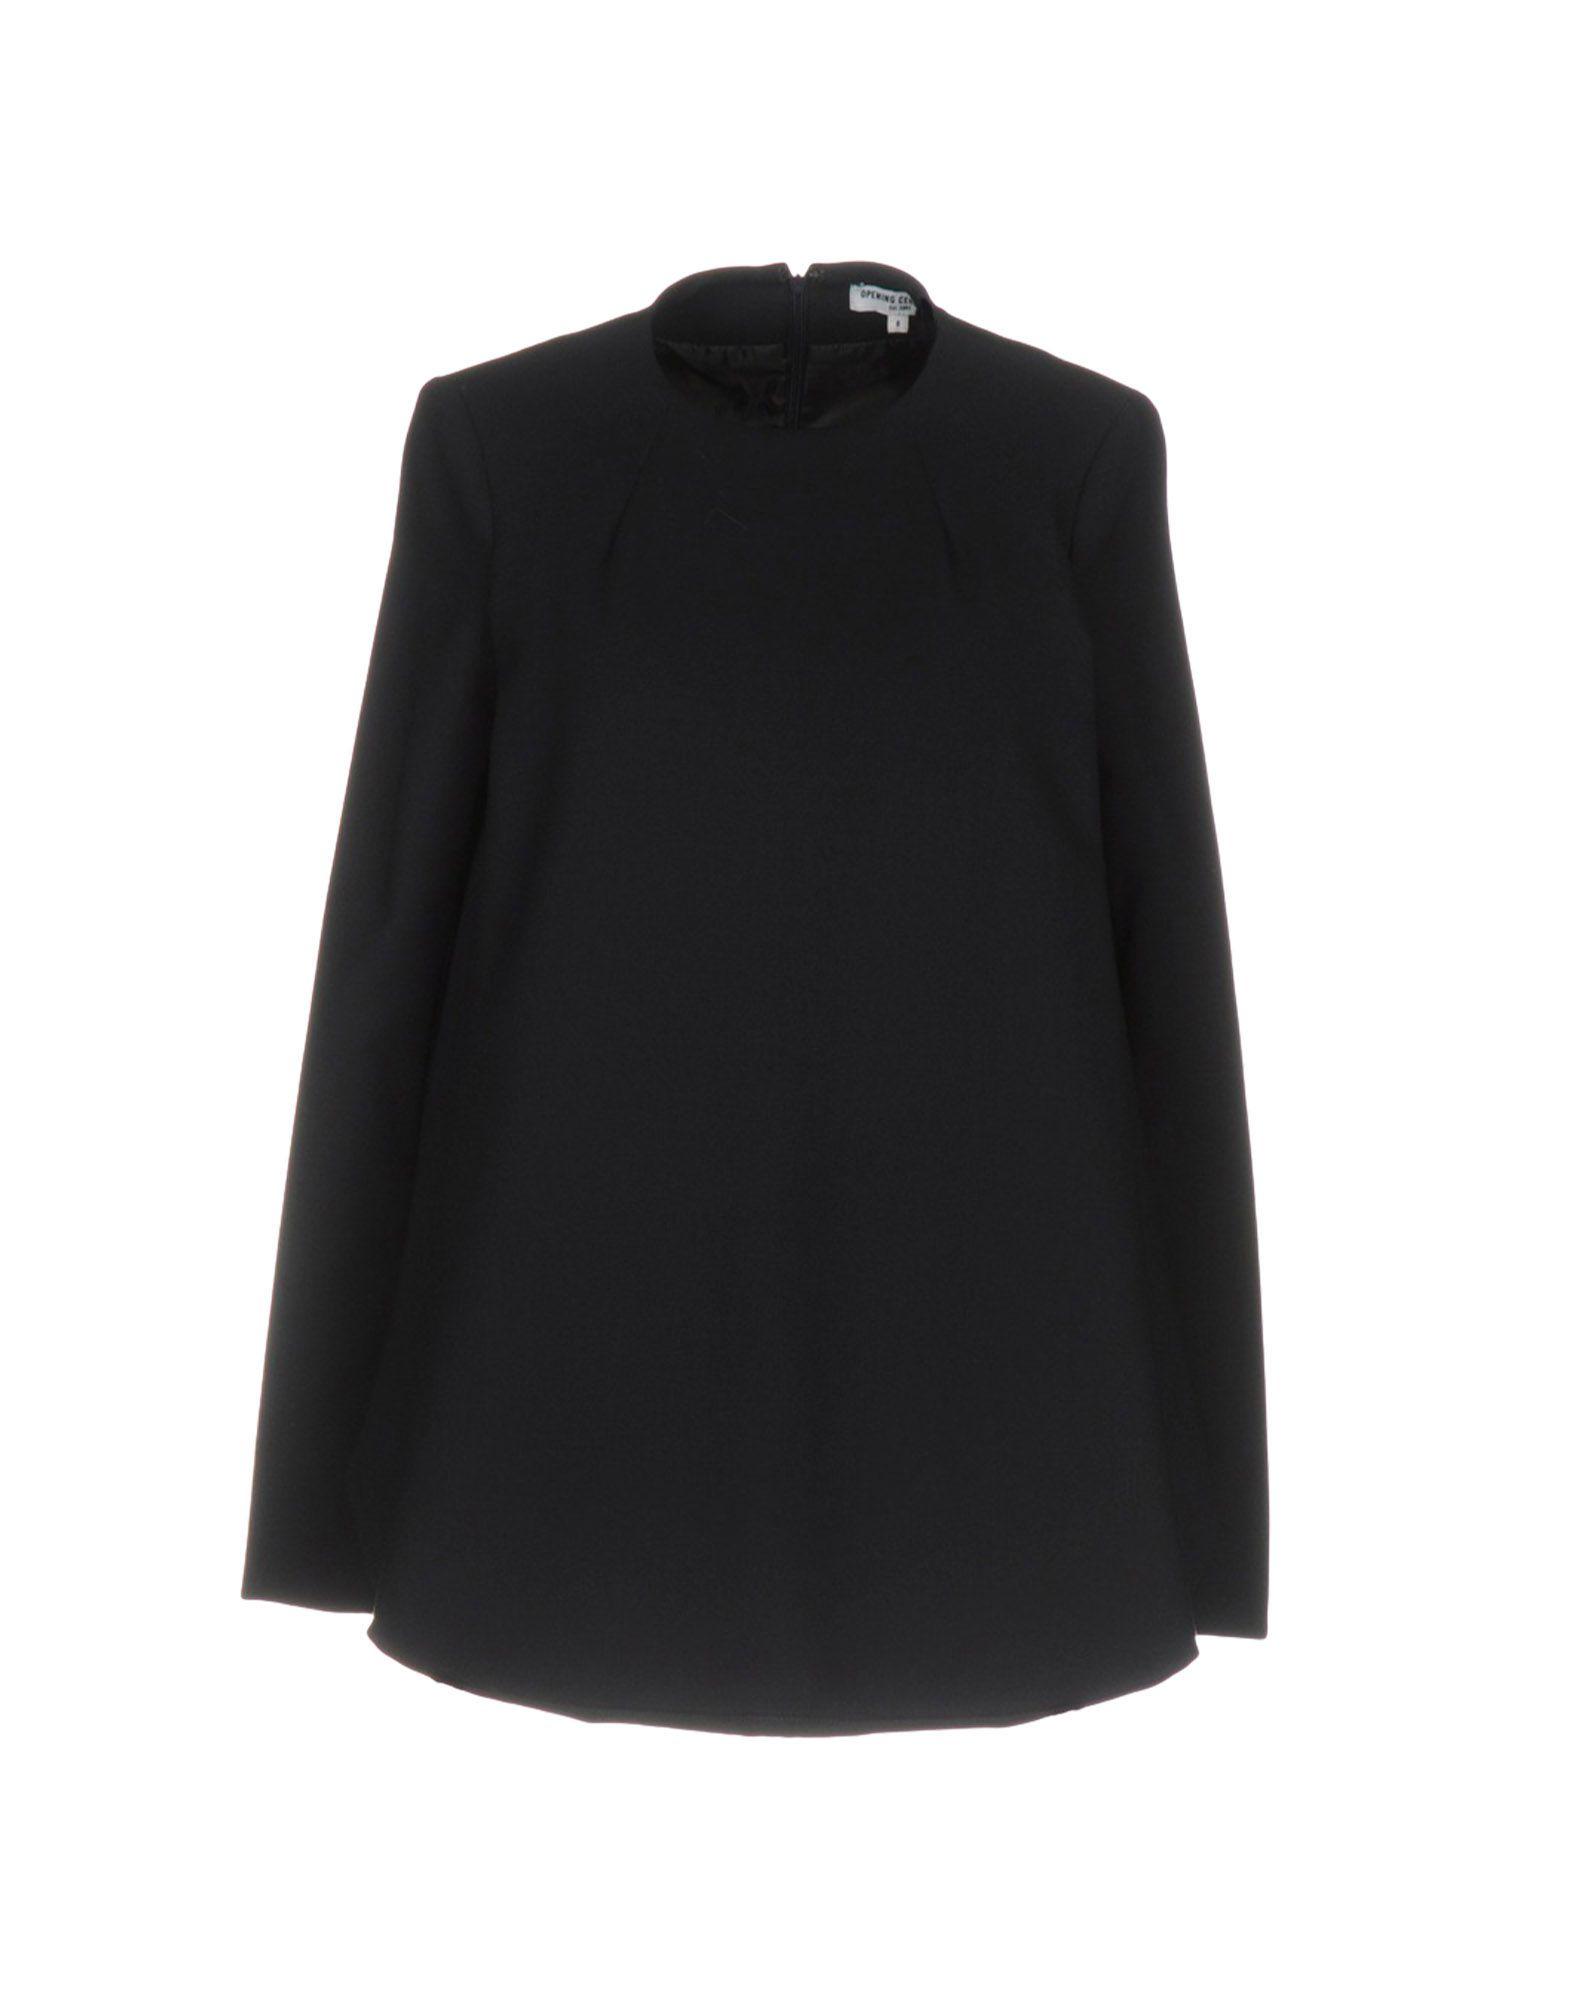 OPENING CEREMONY Damen Bluse Farbe Dunkelblau Größe 1